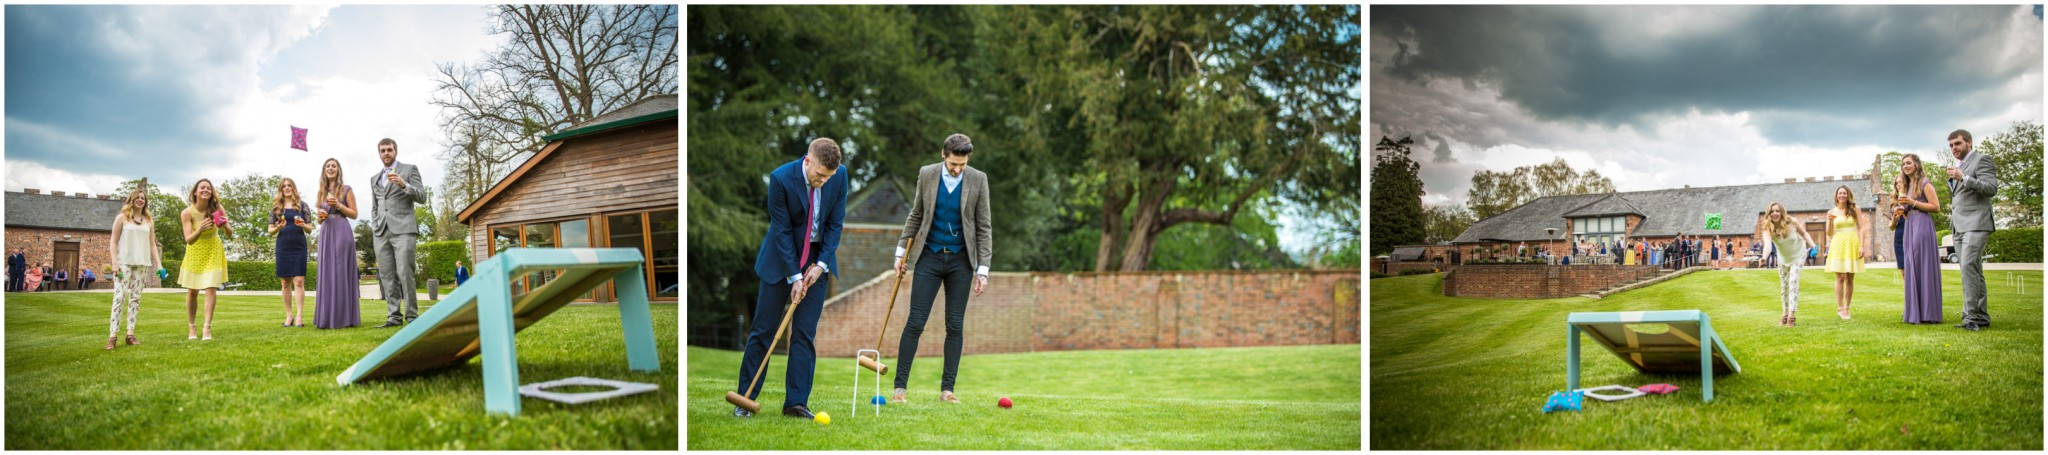 Wasing Park Wedding Photography croquet